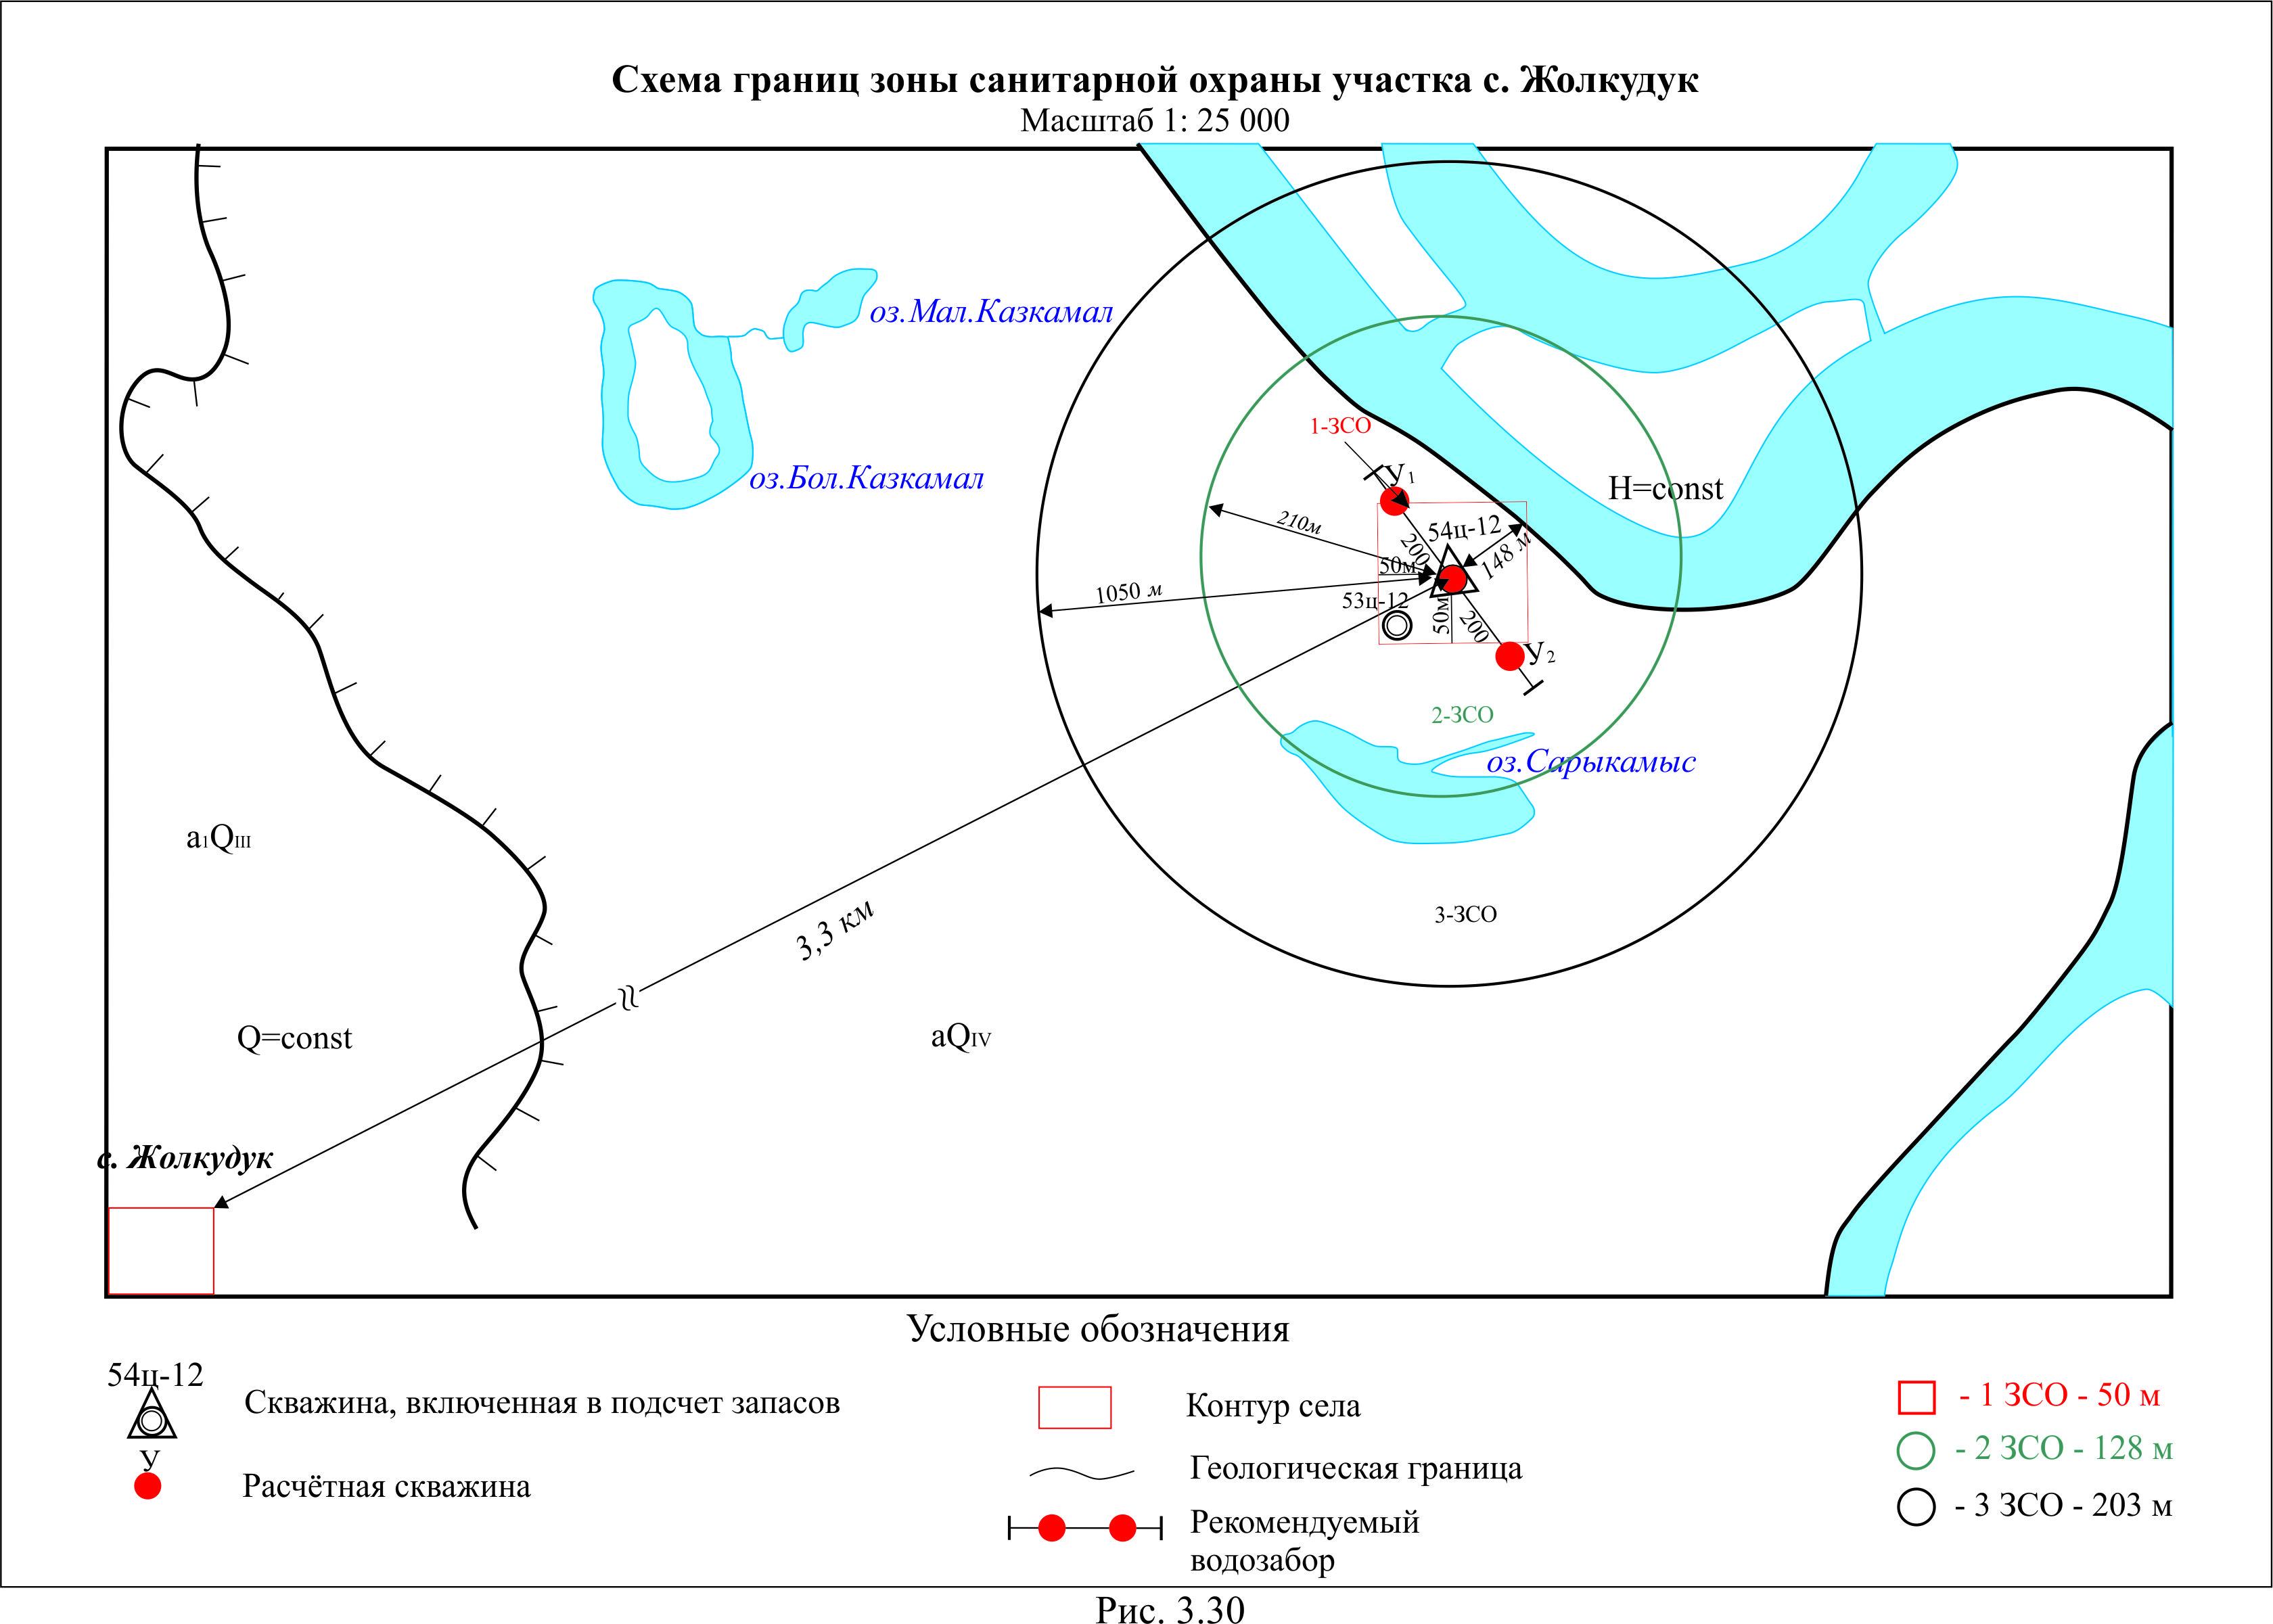 C:\Users\Kimkina_VM\Desktop\от Корнеевой\13-04-2014_16-11-38\Схема водозабора 54ц-12 (1).jpg